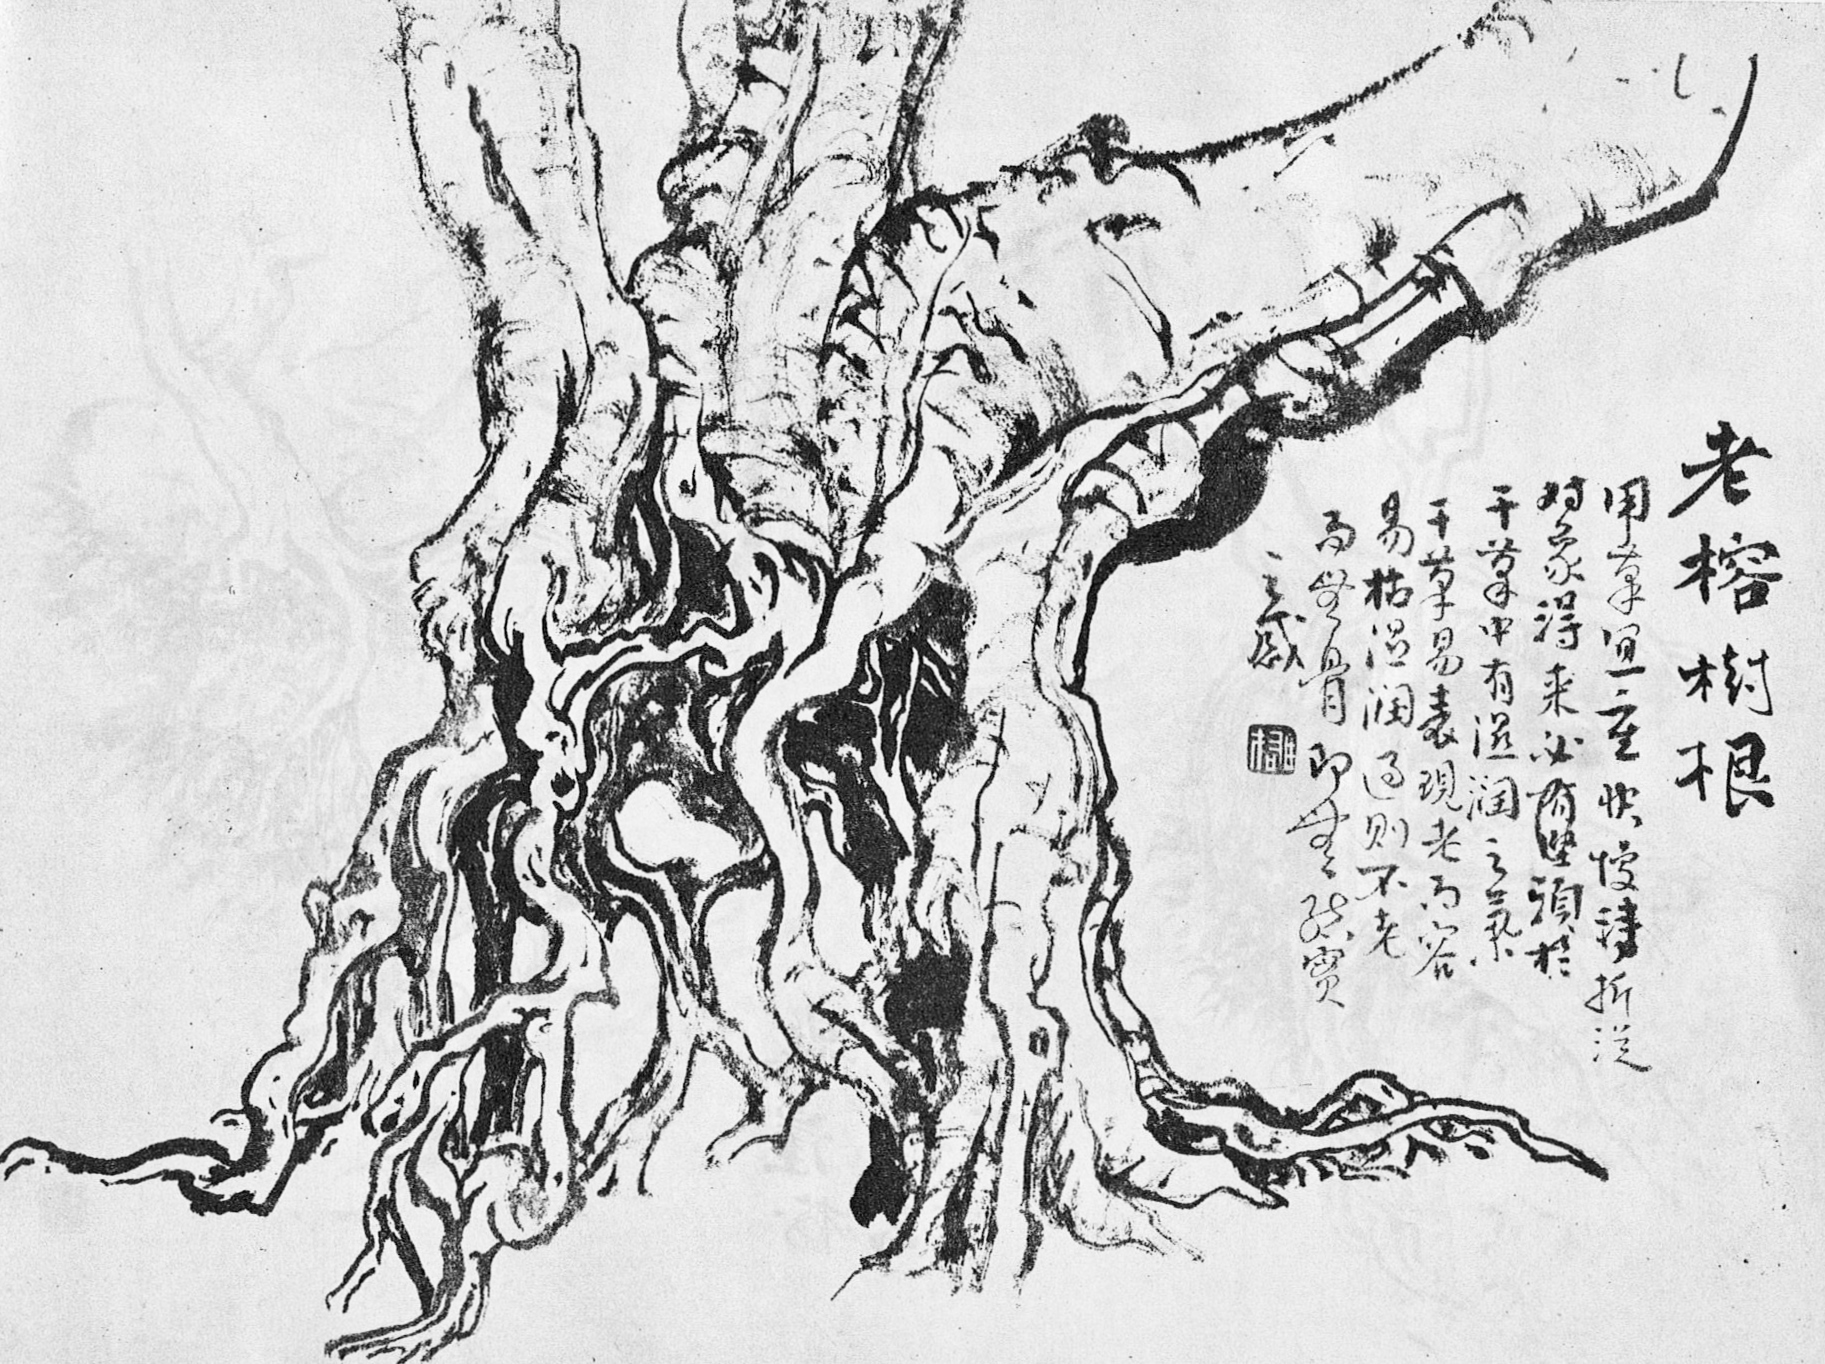 Ficus microcarpa and Ficus macrophylla